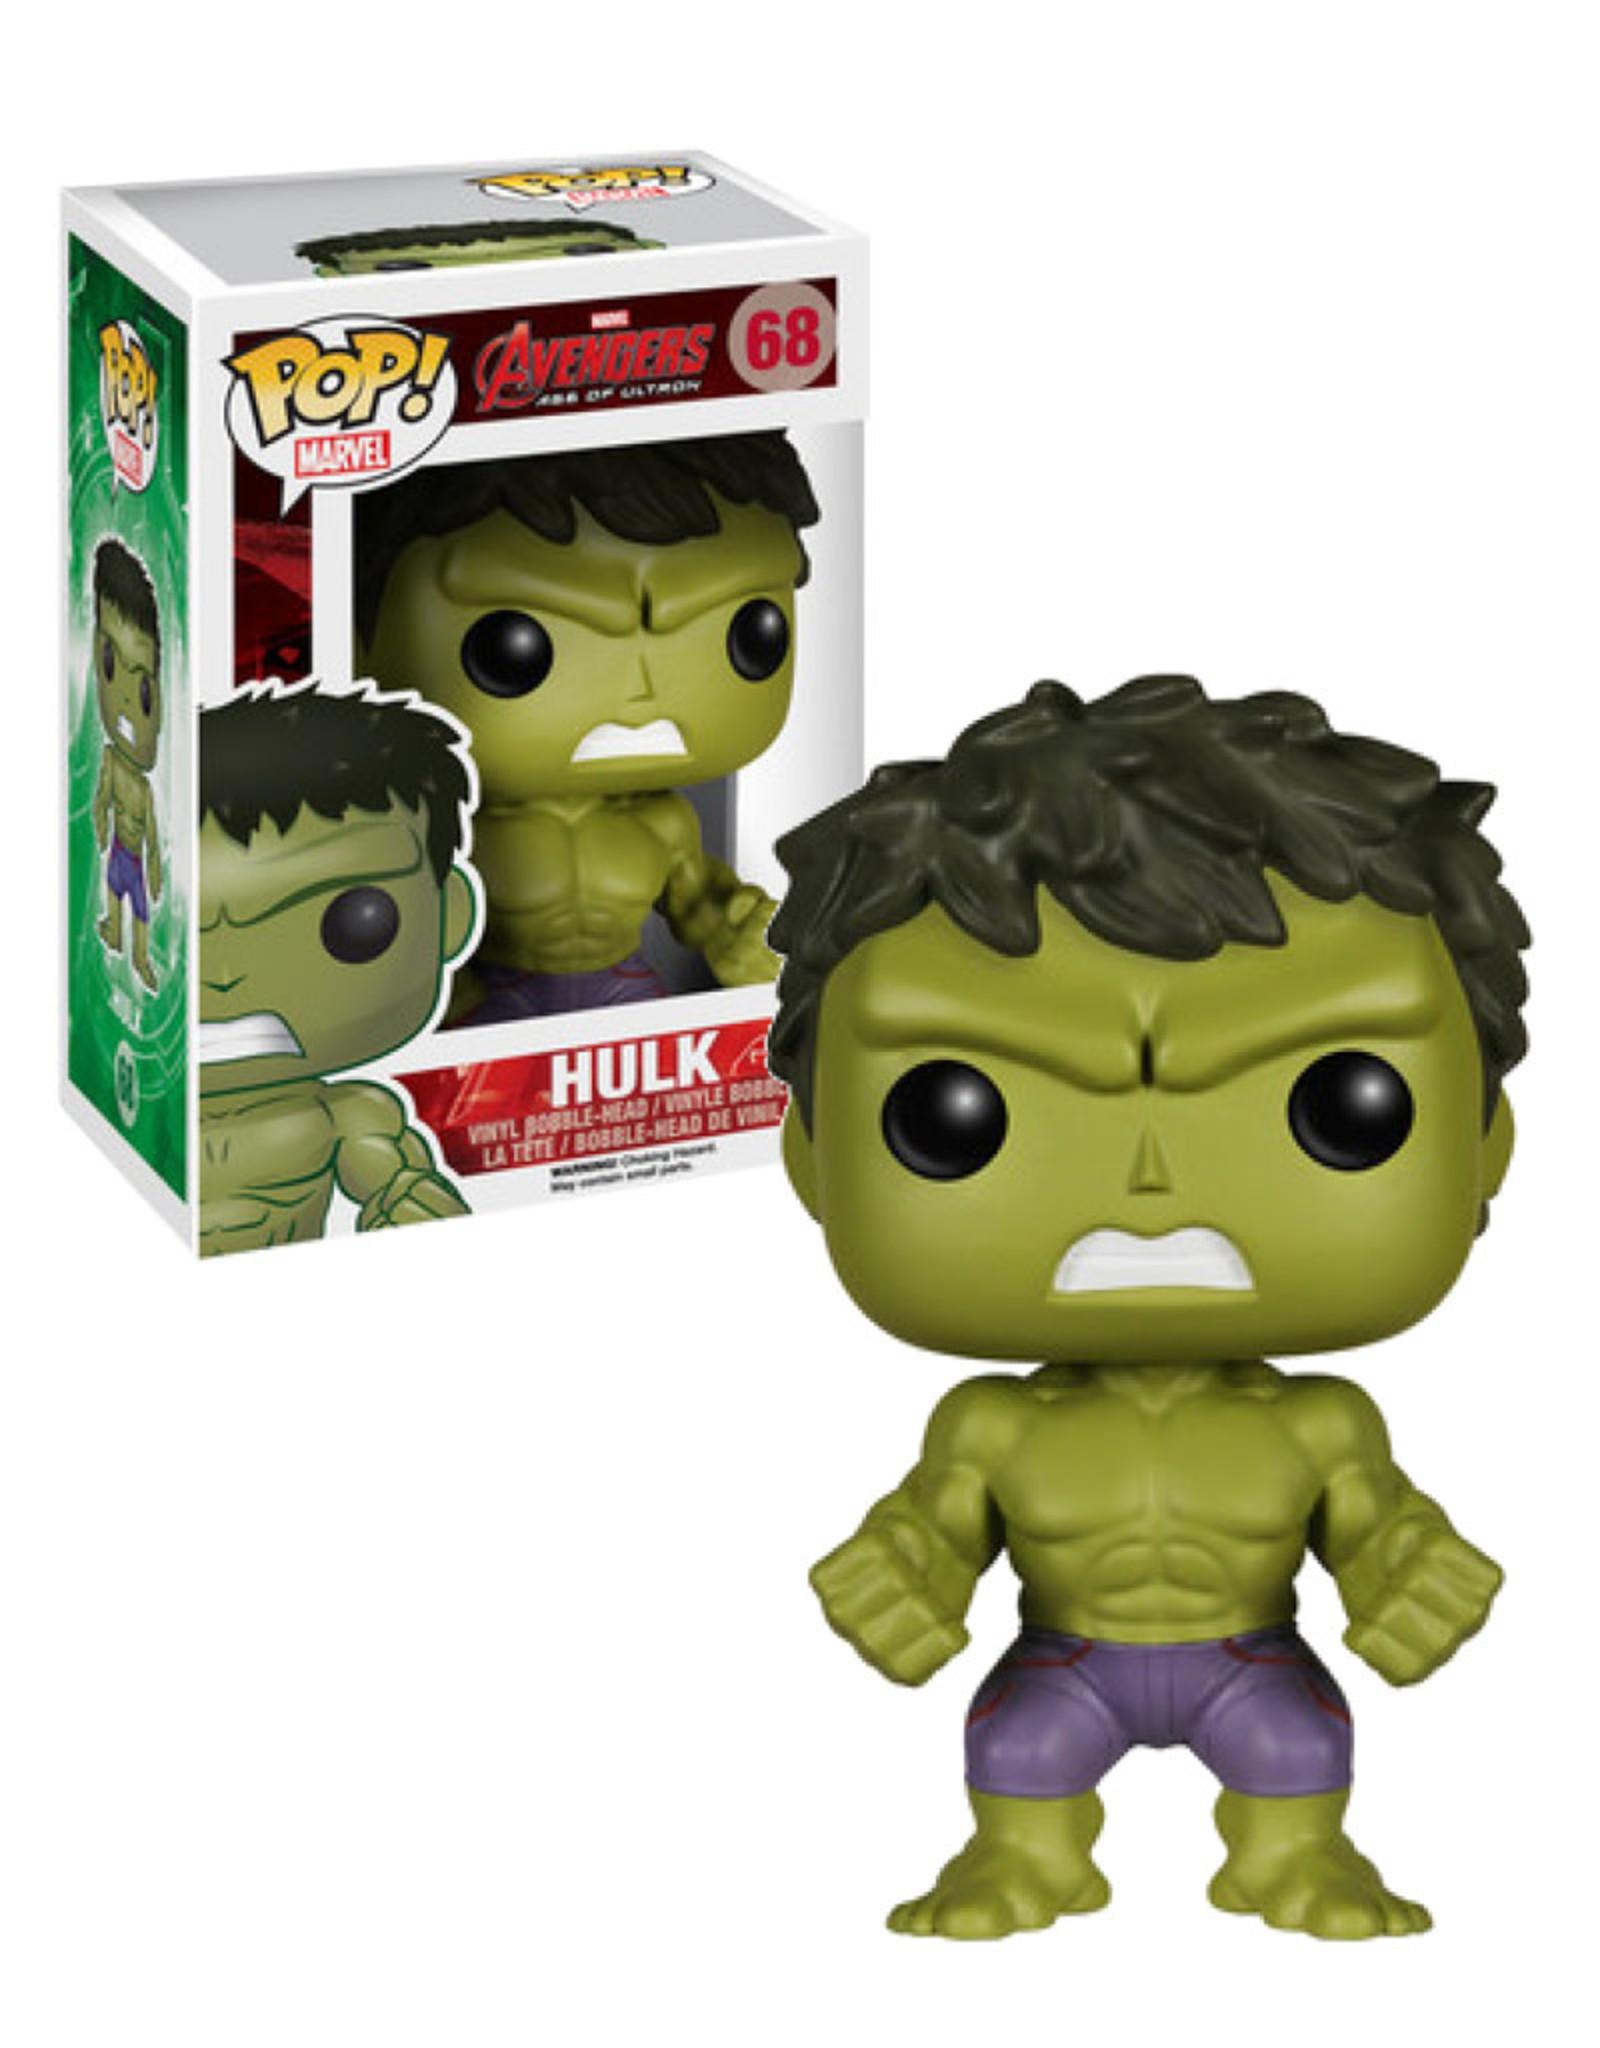 Avengers Age of Ultron 68 ( Funko Pop ) Hulk